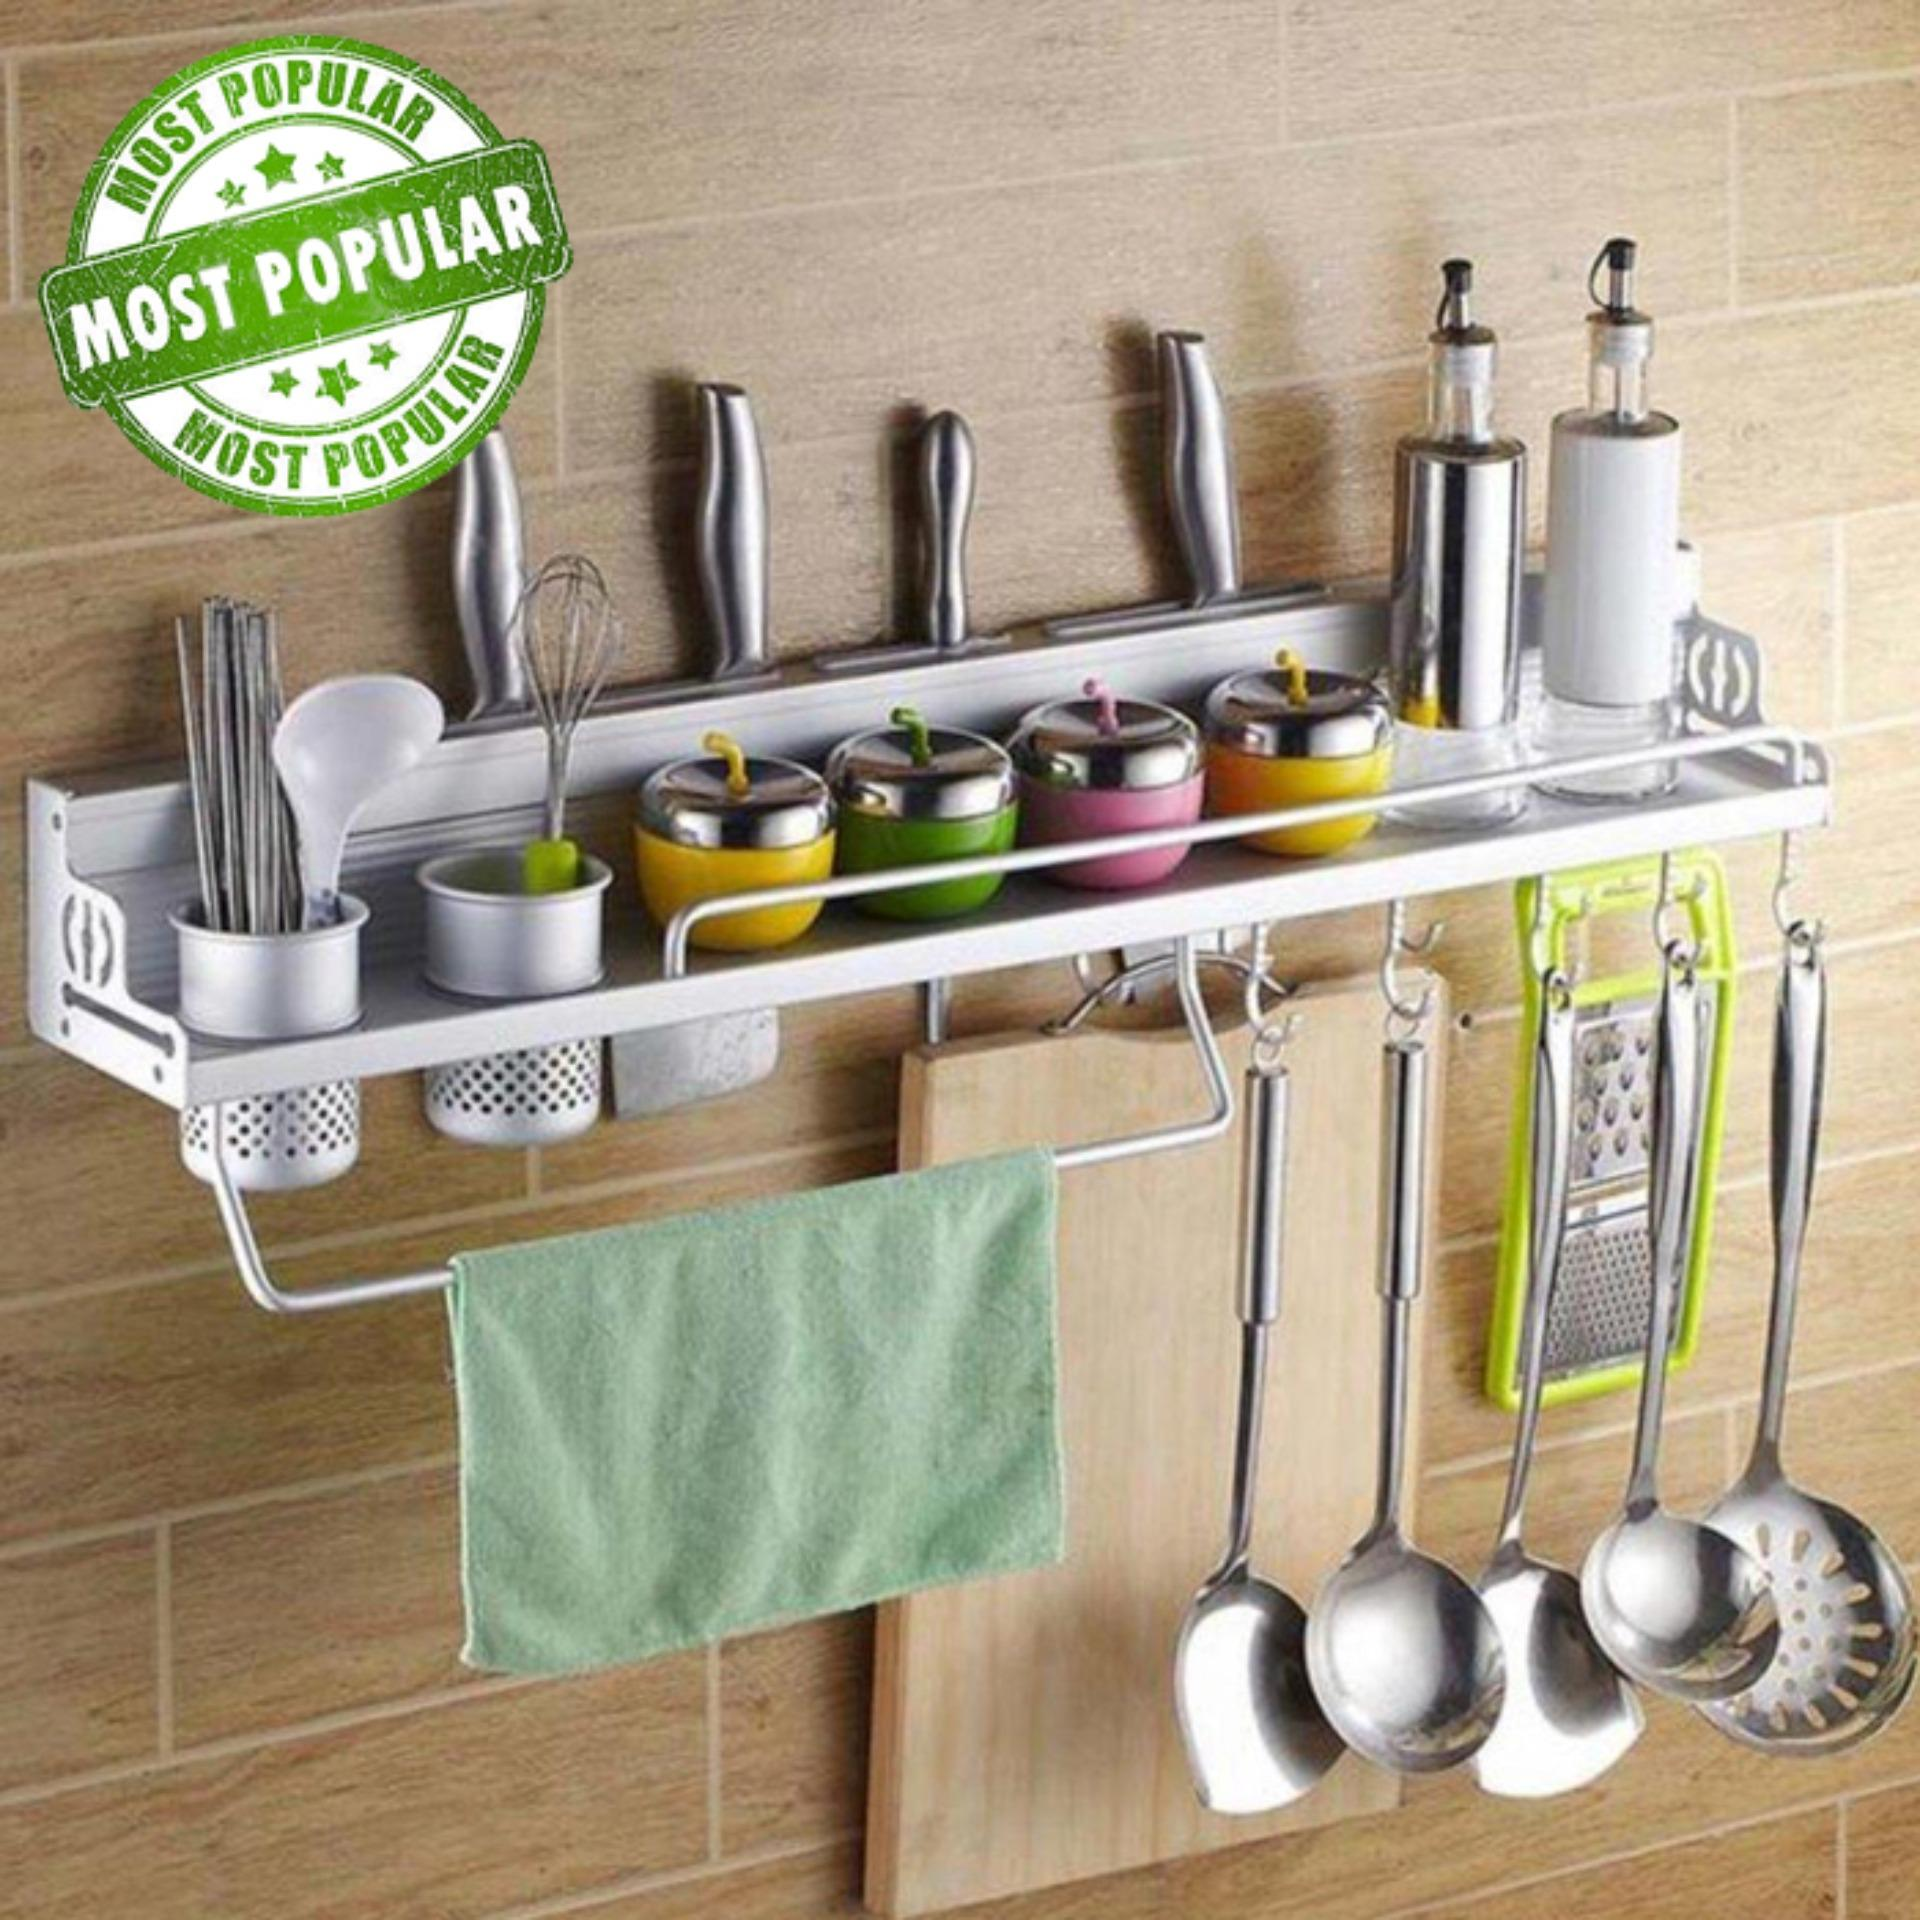 Family Choice Rak Dinding Dapur Aluminium Berkualitas Size 60x12,5x10cm